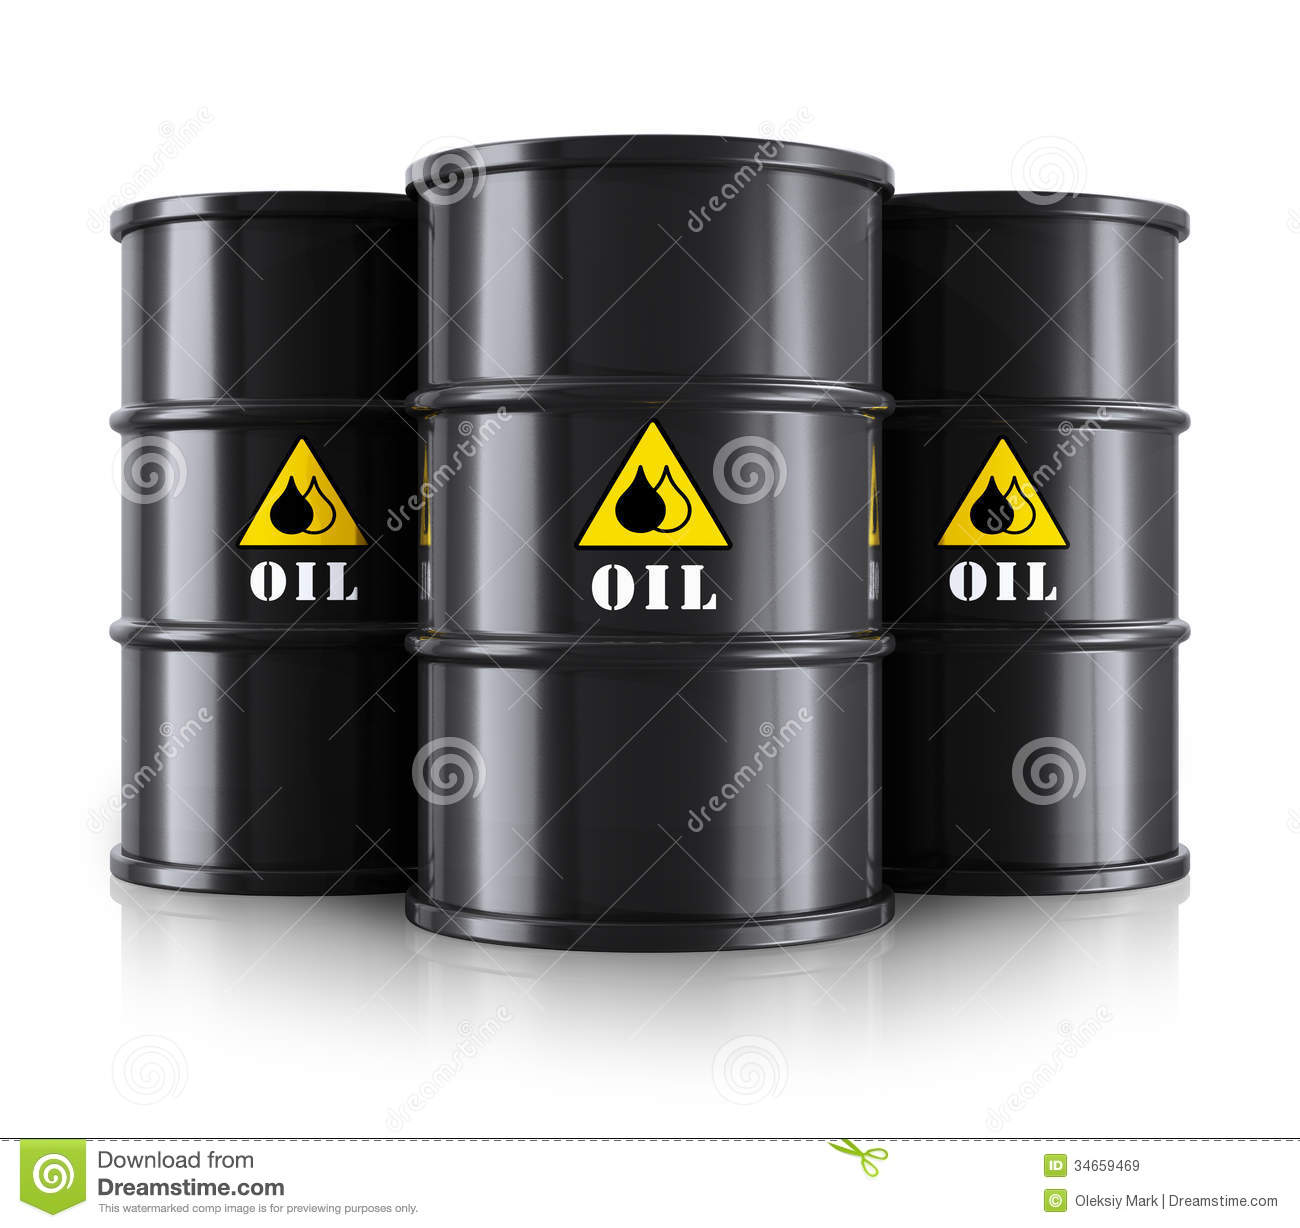 Oil drum clipart no background.